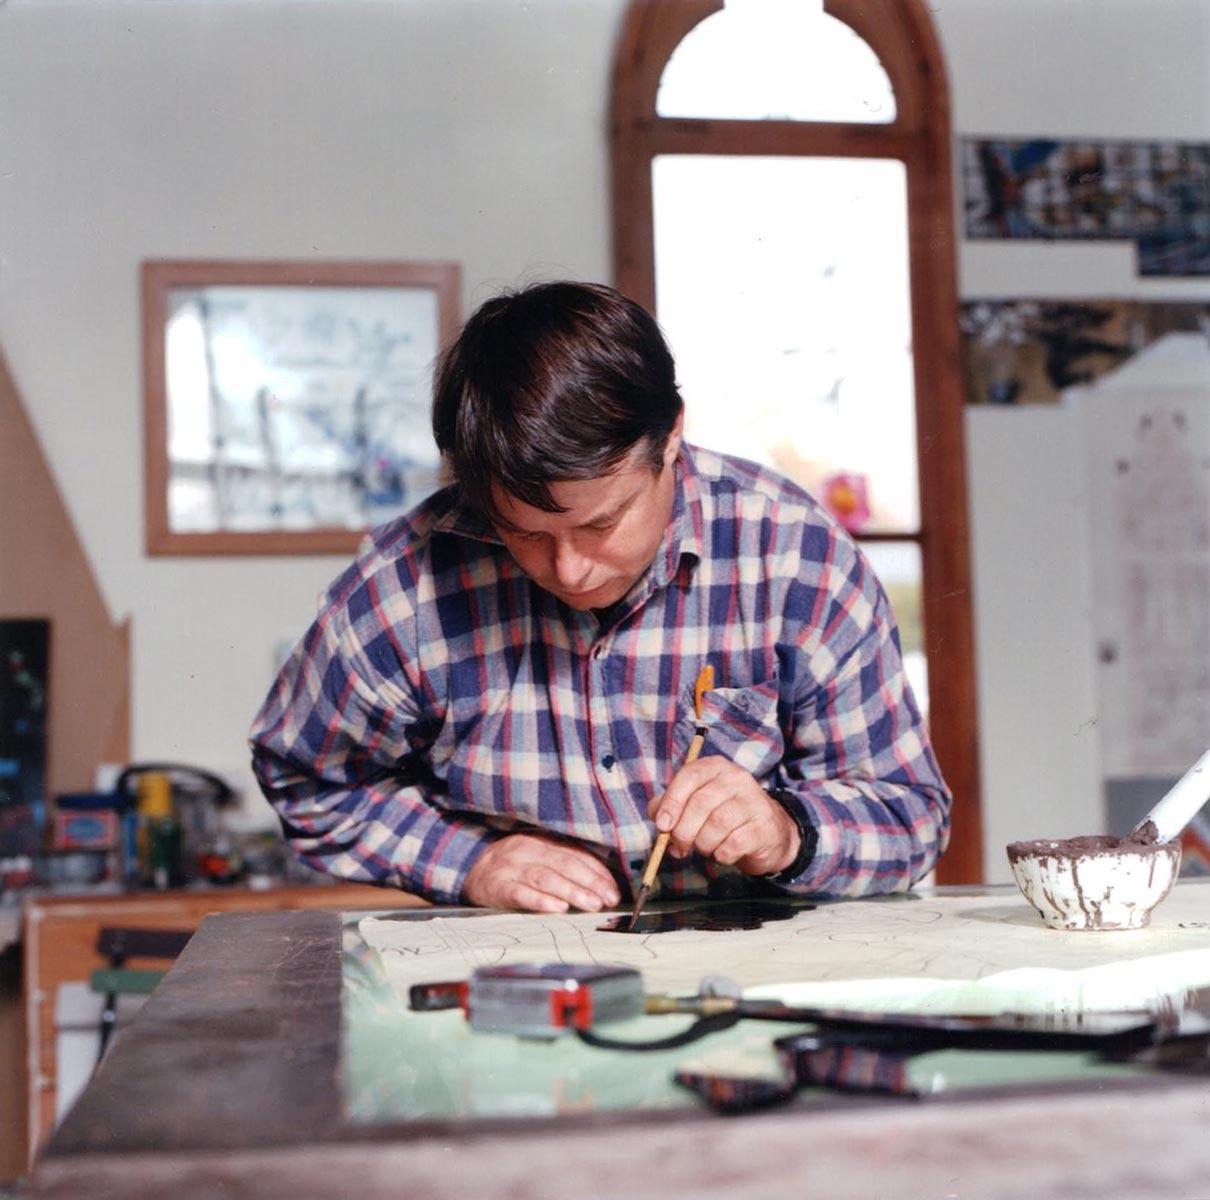 Nigel working on window